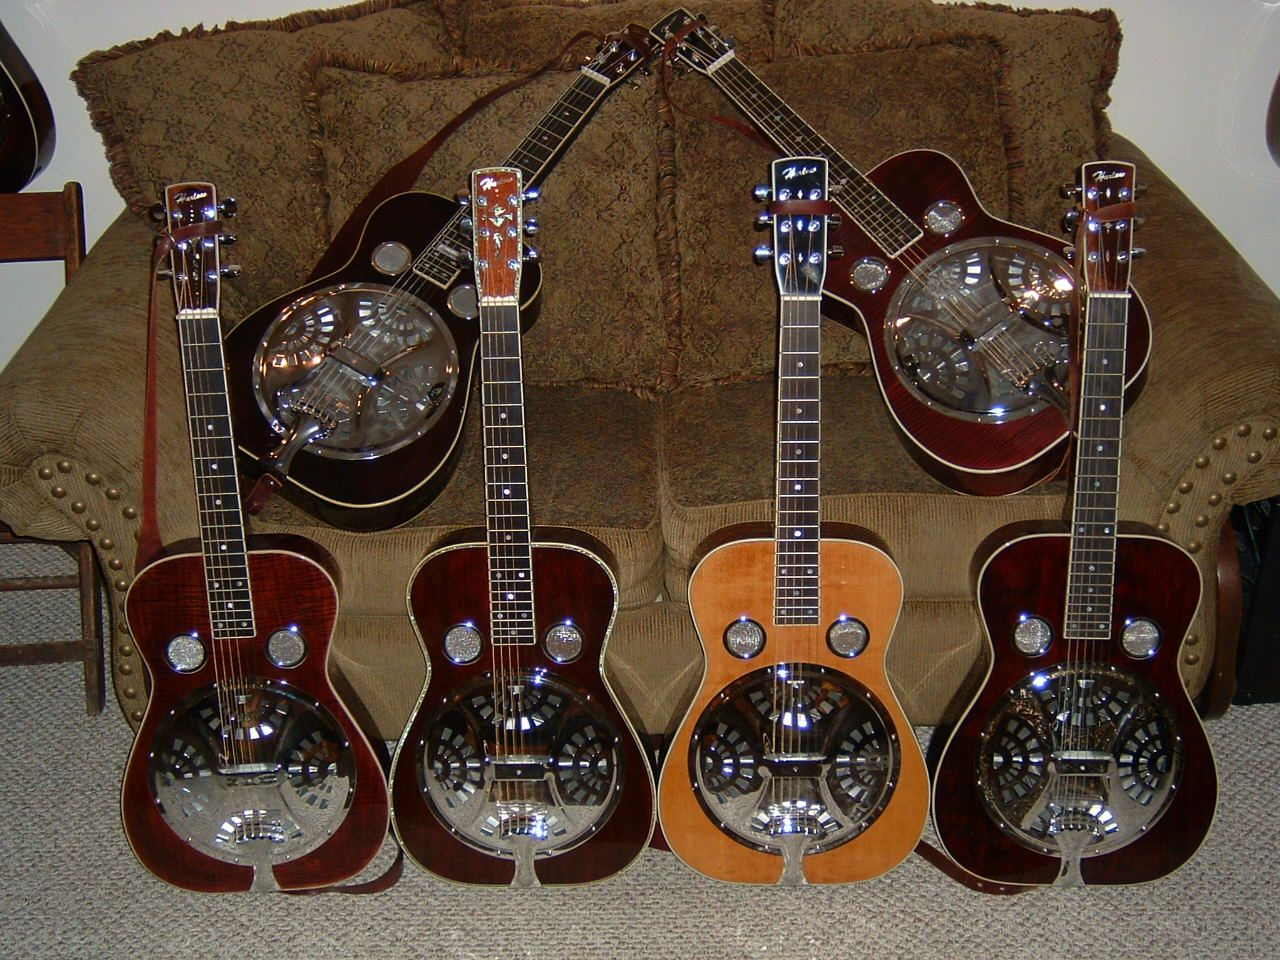 harlow resonator guitars instruments resonator guitar guitar archtop guitar. Black Bedroom Furniture Sets. Home Design Ideas